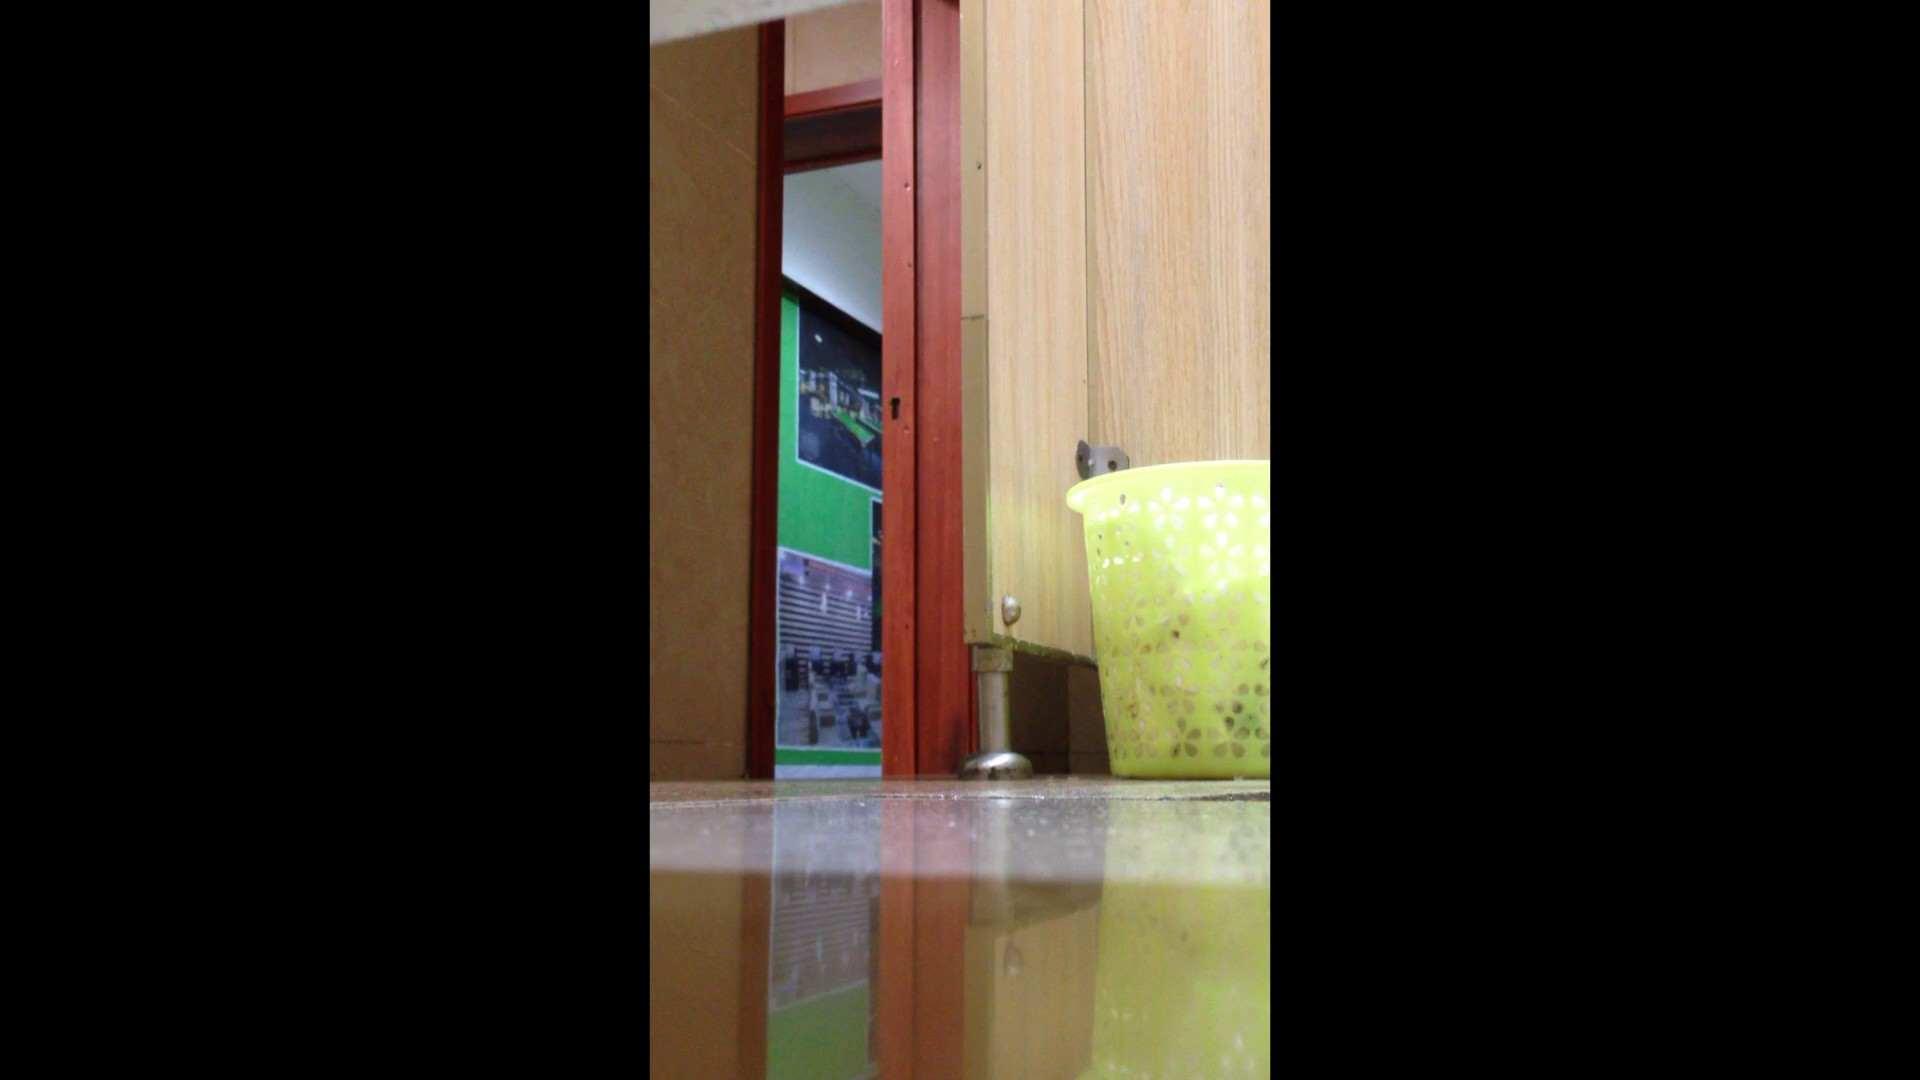 芸術大学ガチ潜入盗撮 JD盗撮 美女の洗面所の秘密 Vol.87 盗撮  79枚 72